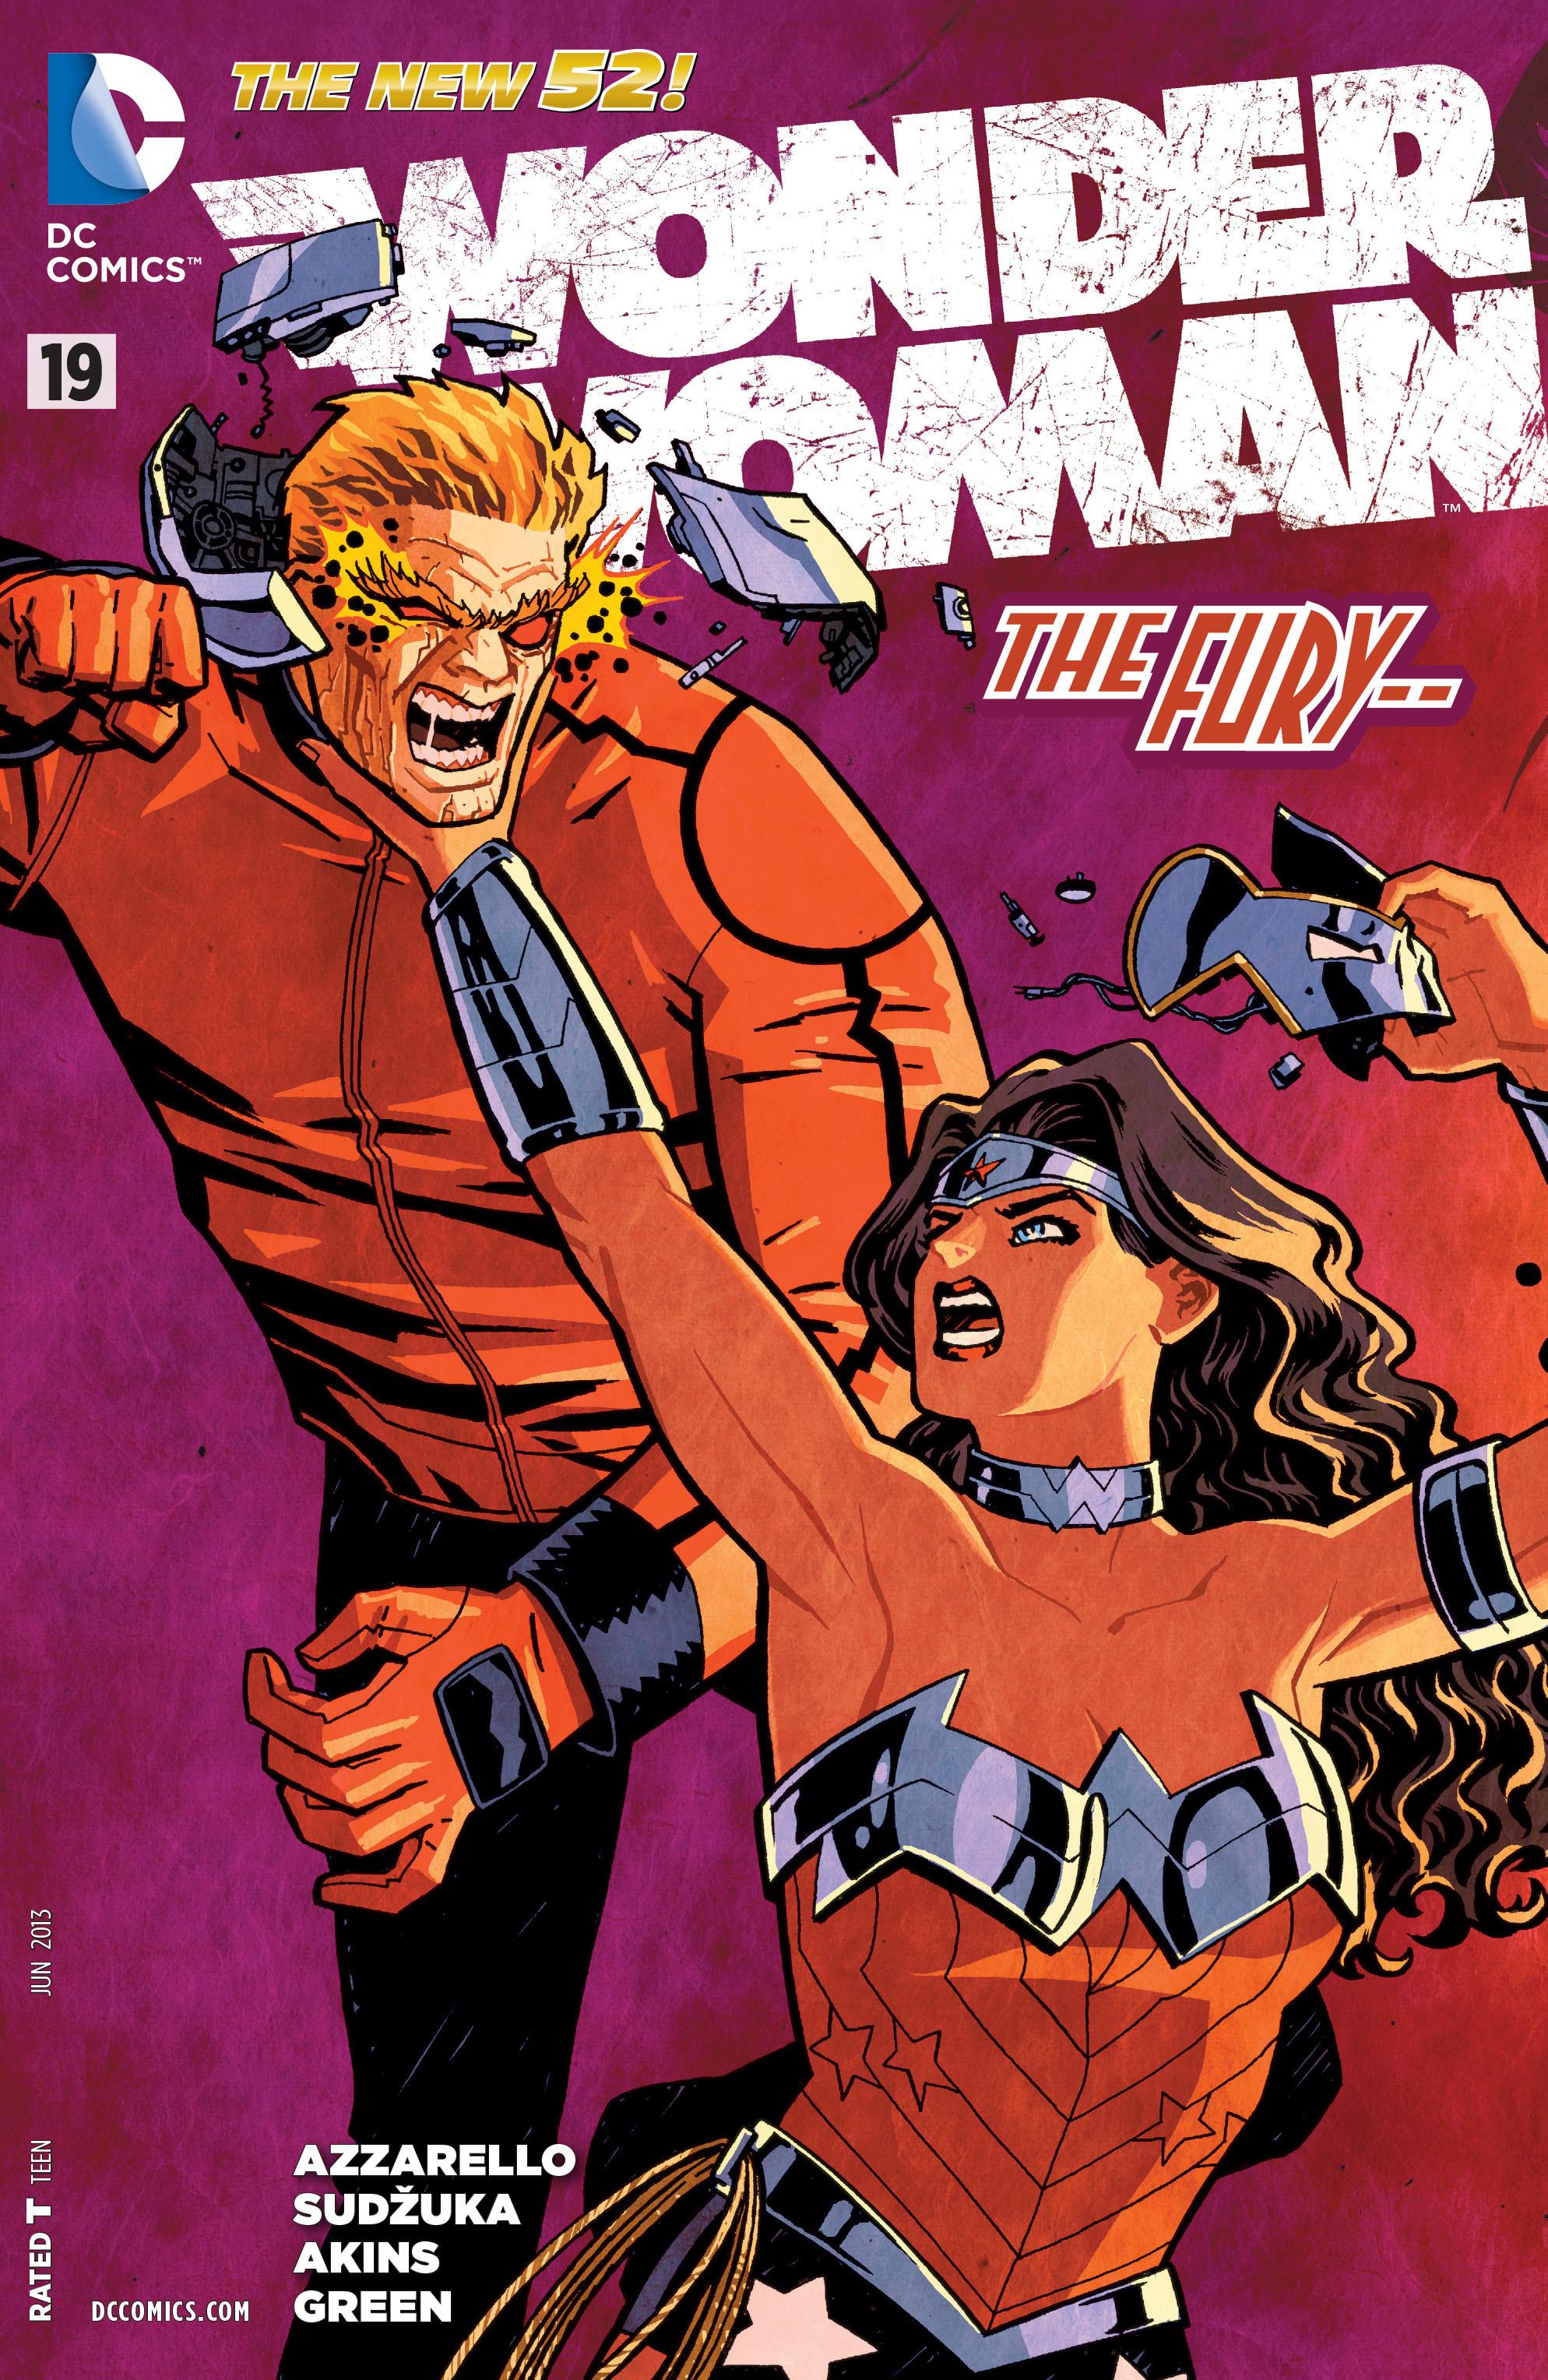 Read online Wonder Woman (2011) comic -  Issue #19 - 1